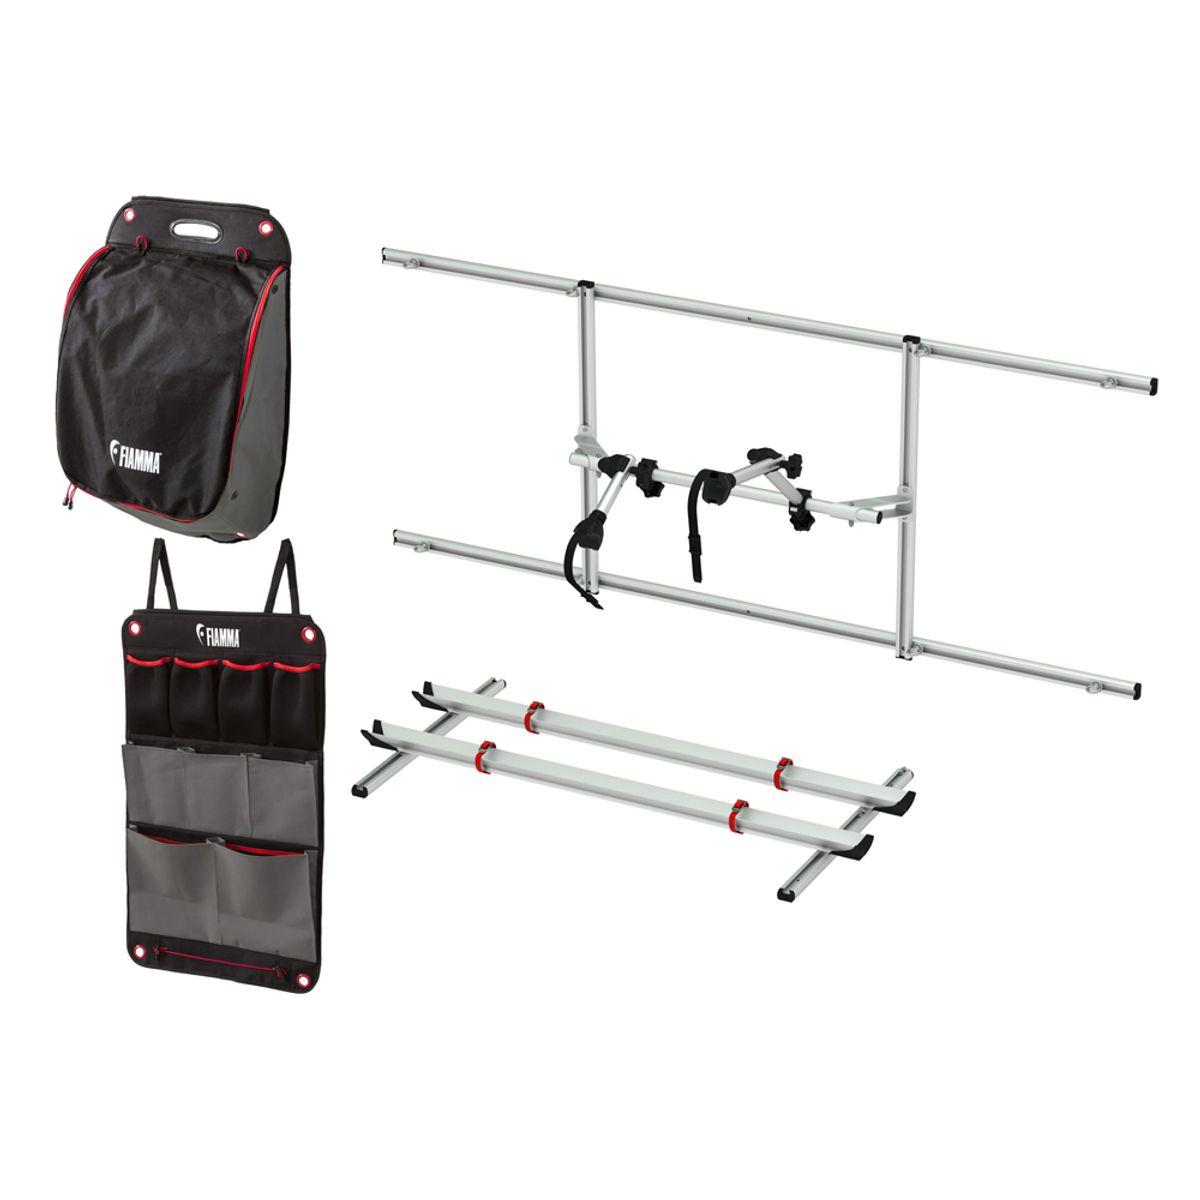 Fiamma Garage Pack Plus Multipurpose Carry Bike Garage